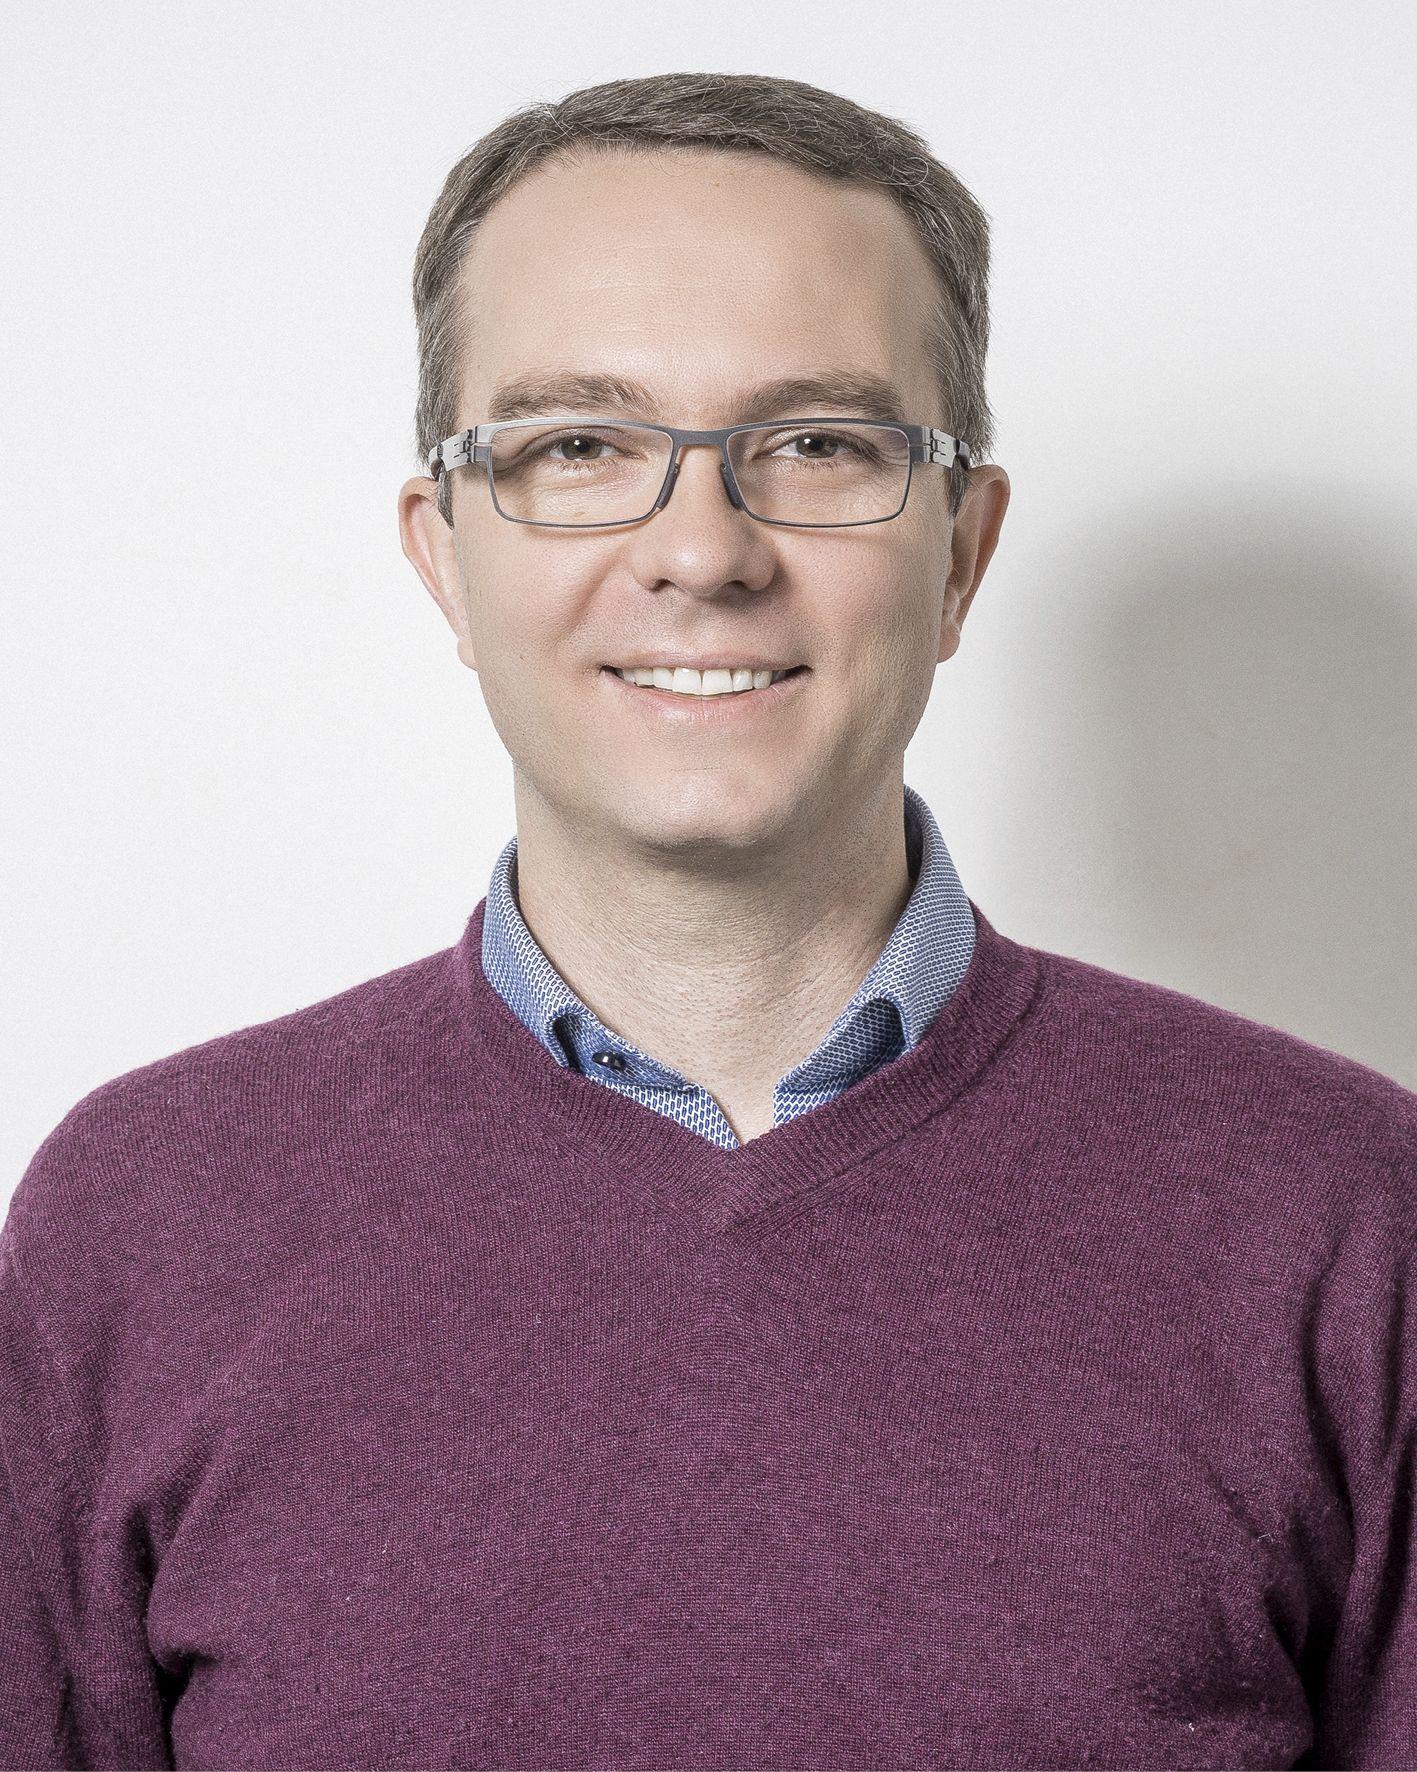 Udo Schuster